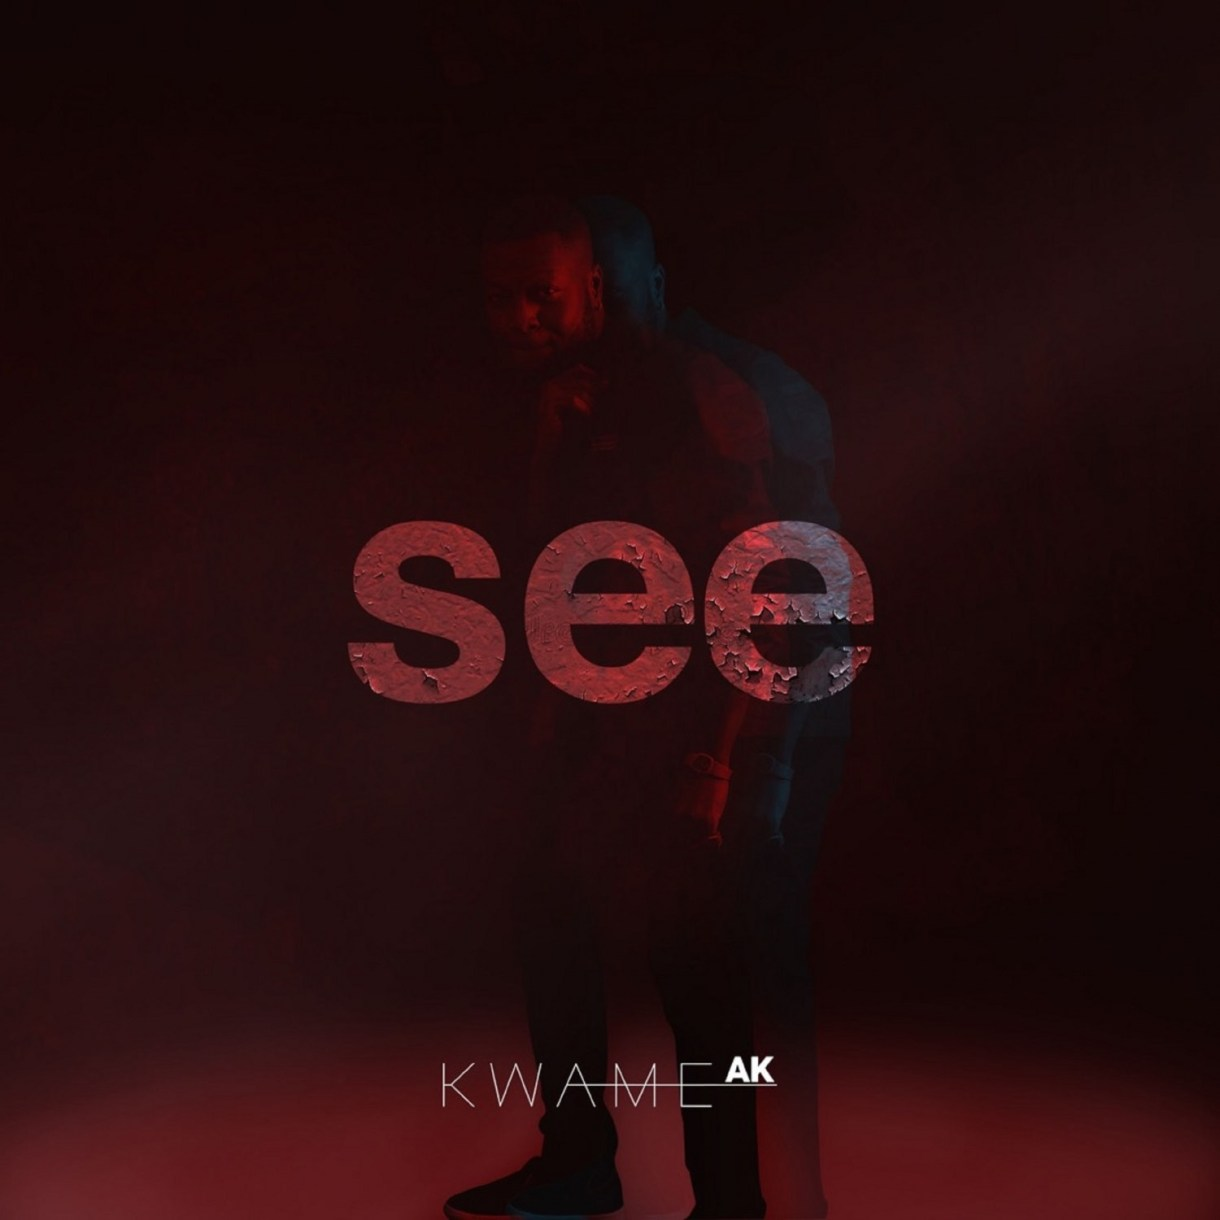 Kwame Ak - See mp3 download